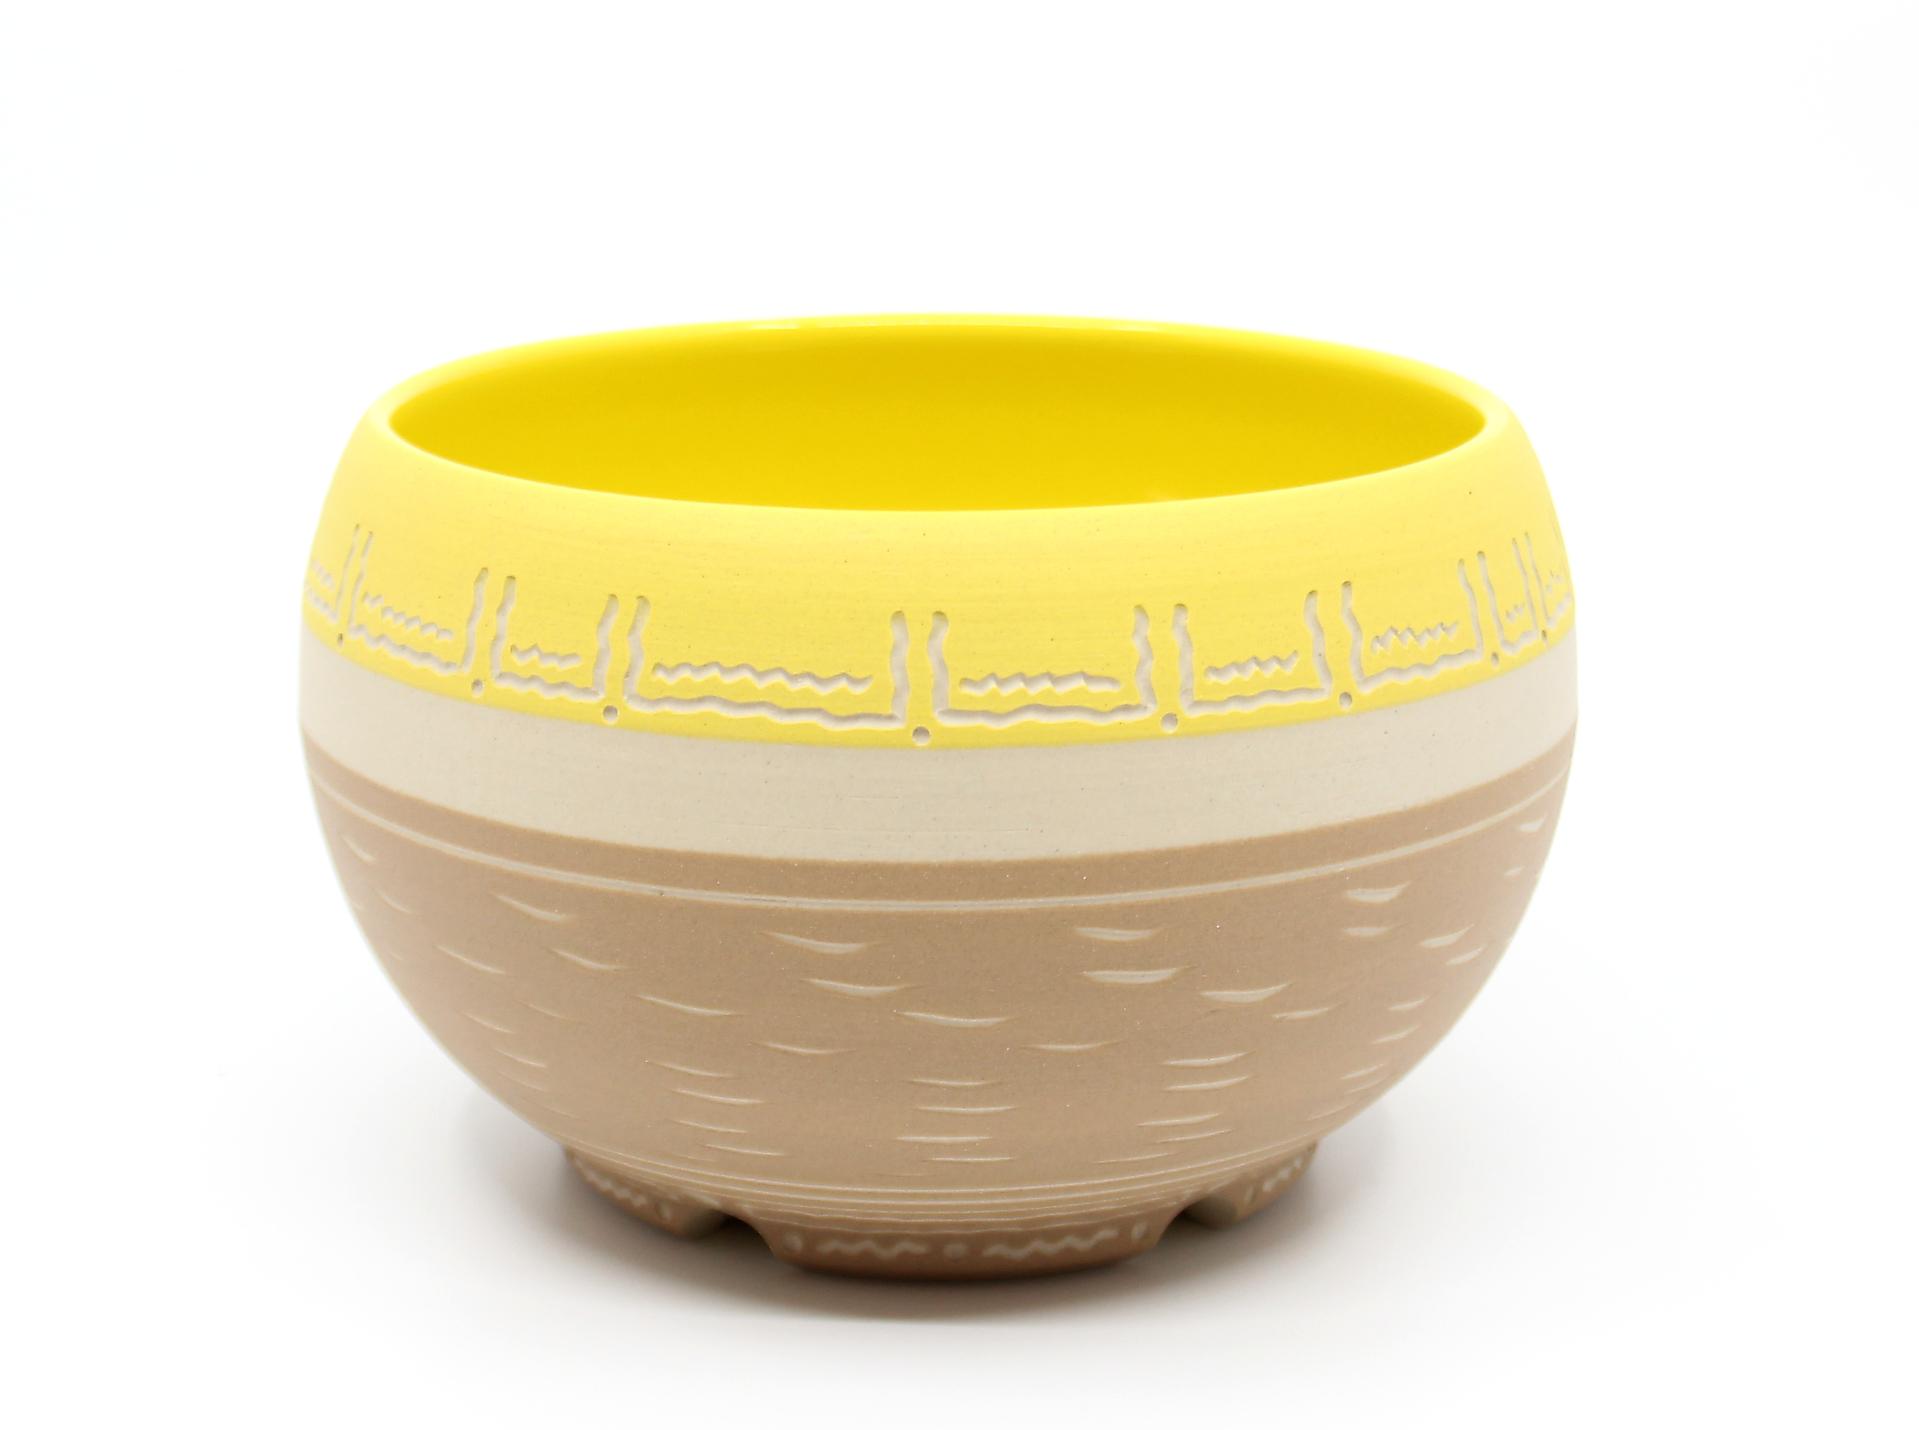 Cinnamon & Yellow Bowl by Chris Casey